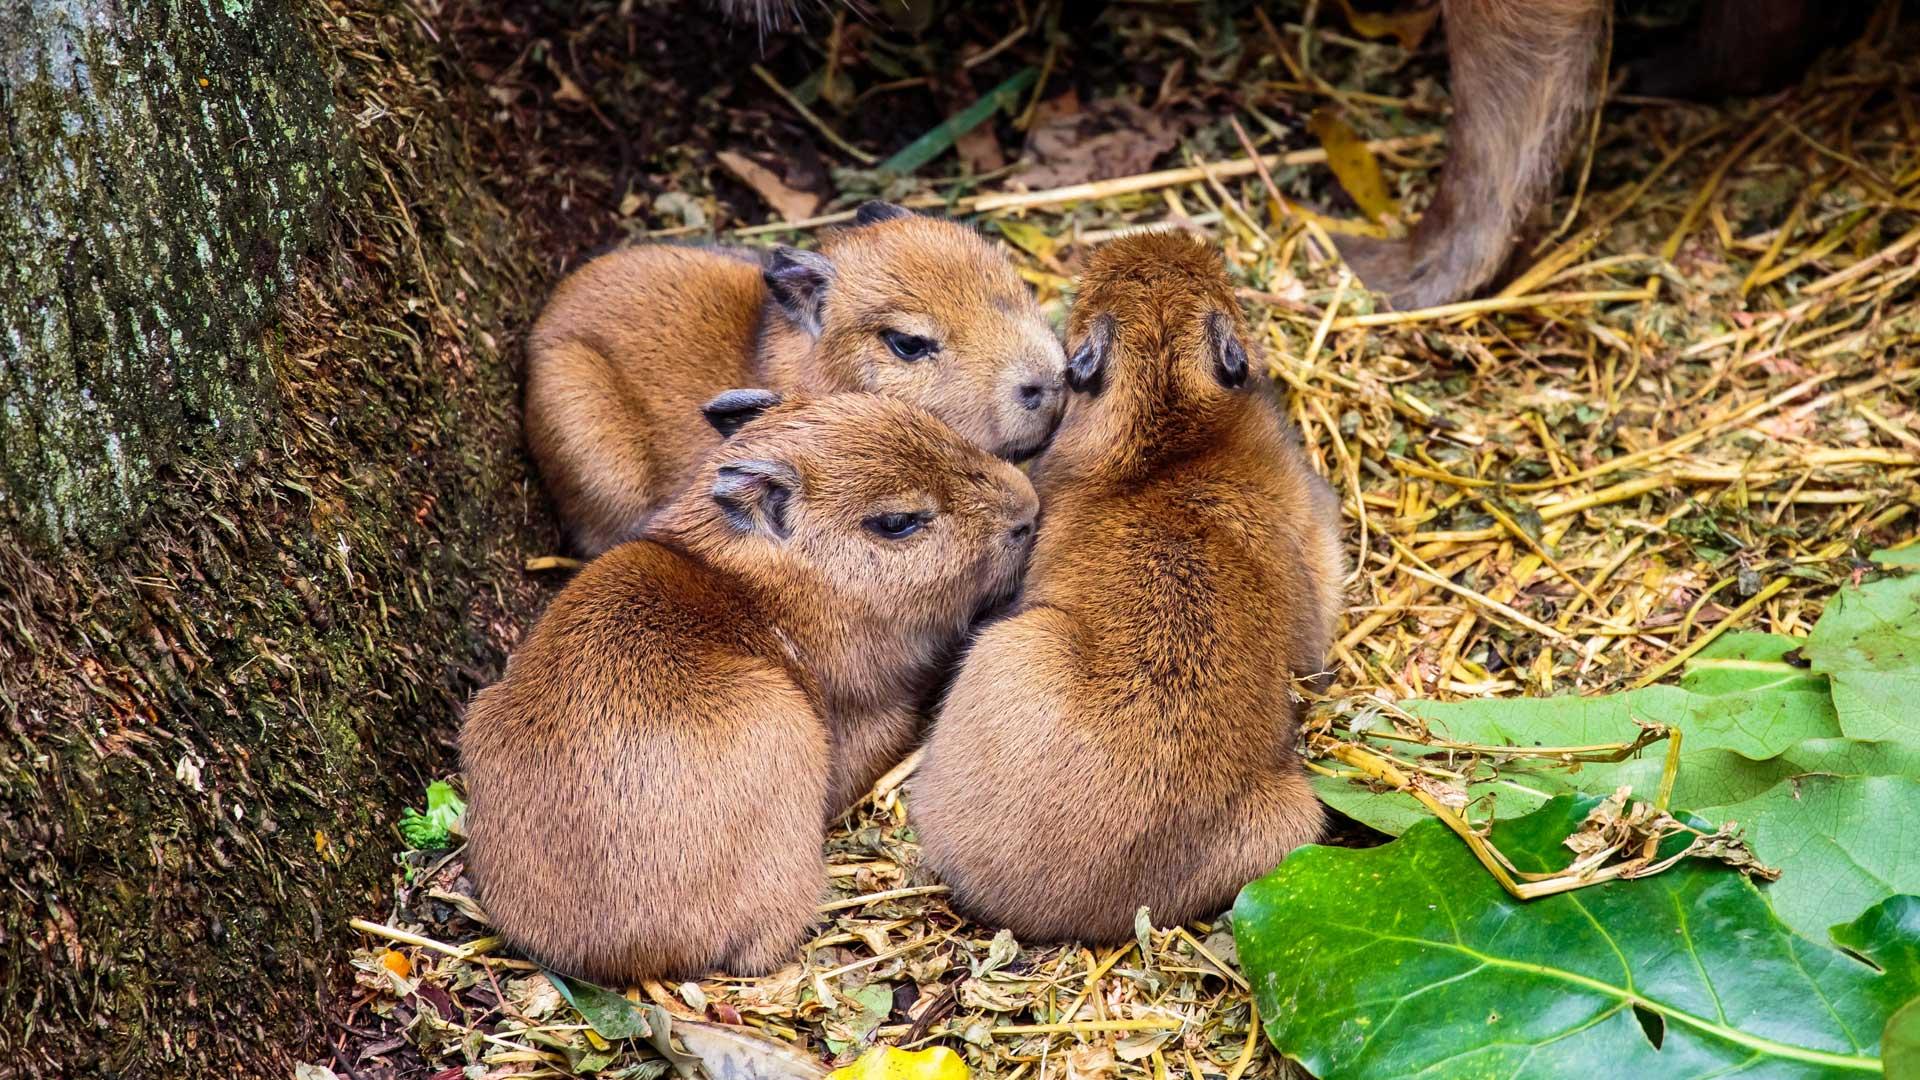 https://rfacdn.nz/zoo/assets/media/capybara-with-pups-gallery-2.jpg